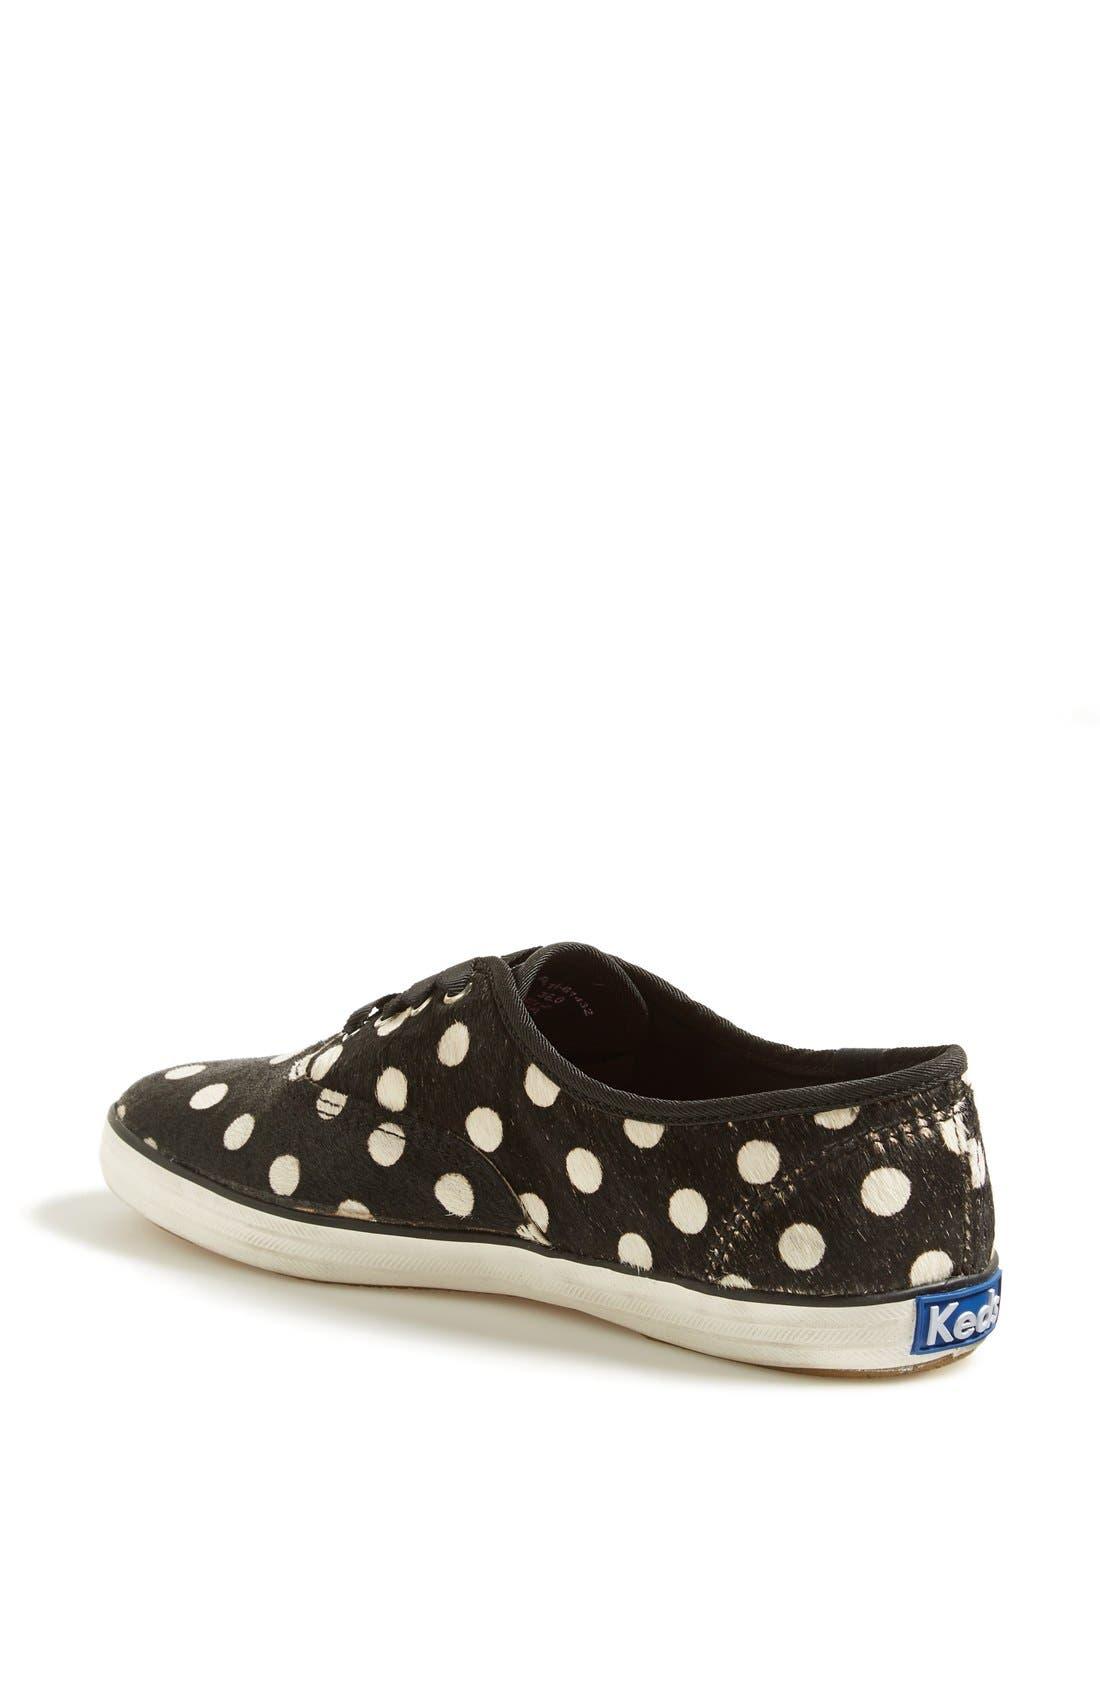 Alternate Image 2  - Keds® 'Champion Spur' Calf Hair Sneaker (Online Only) (Women)